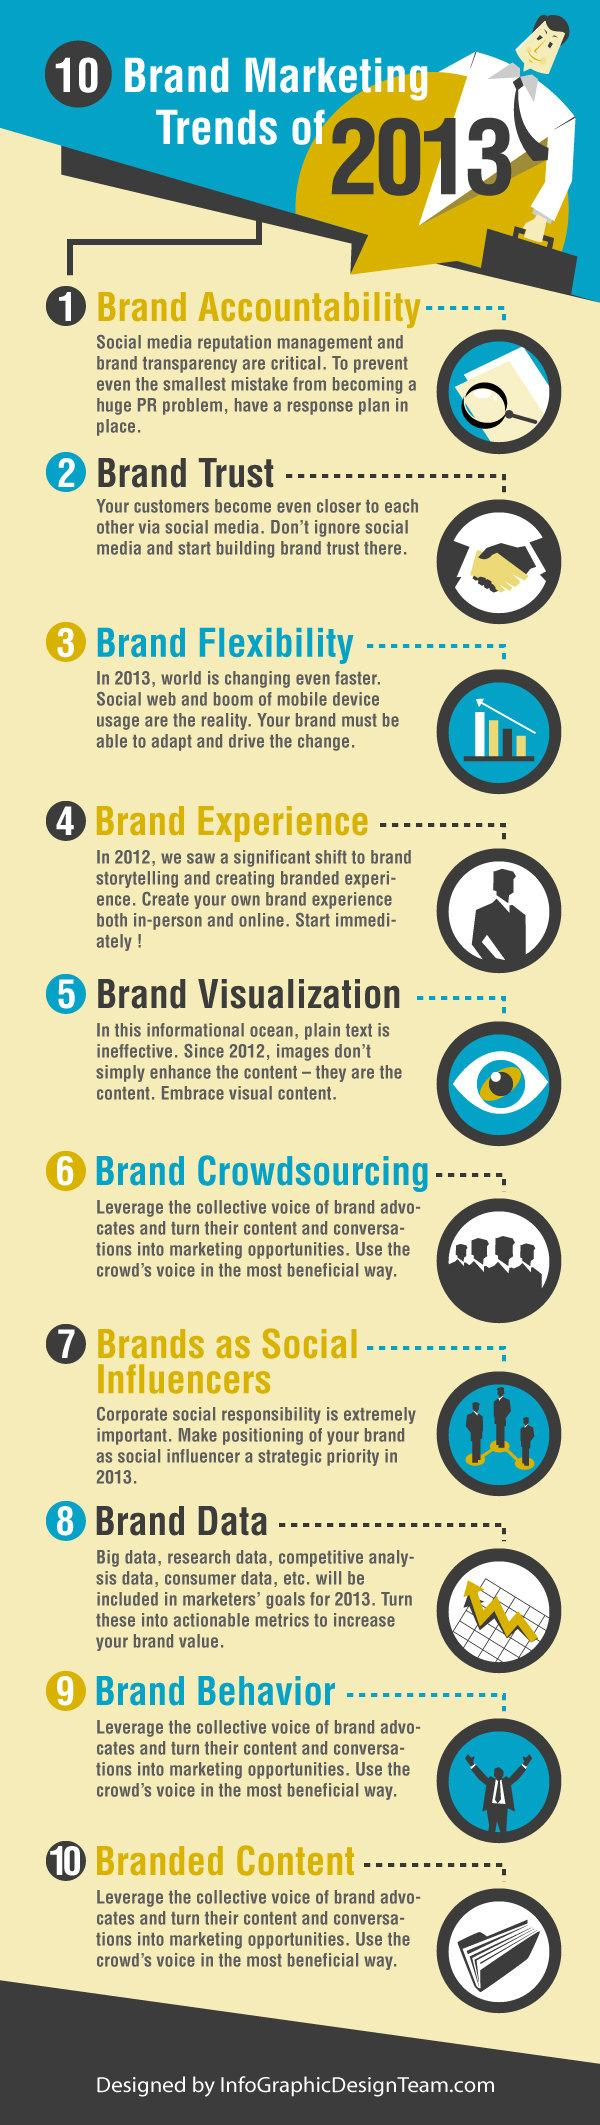 Top 10 Brand Marketing Trends #infografic